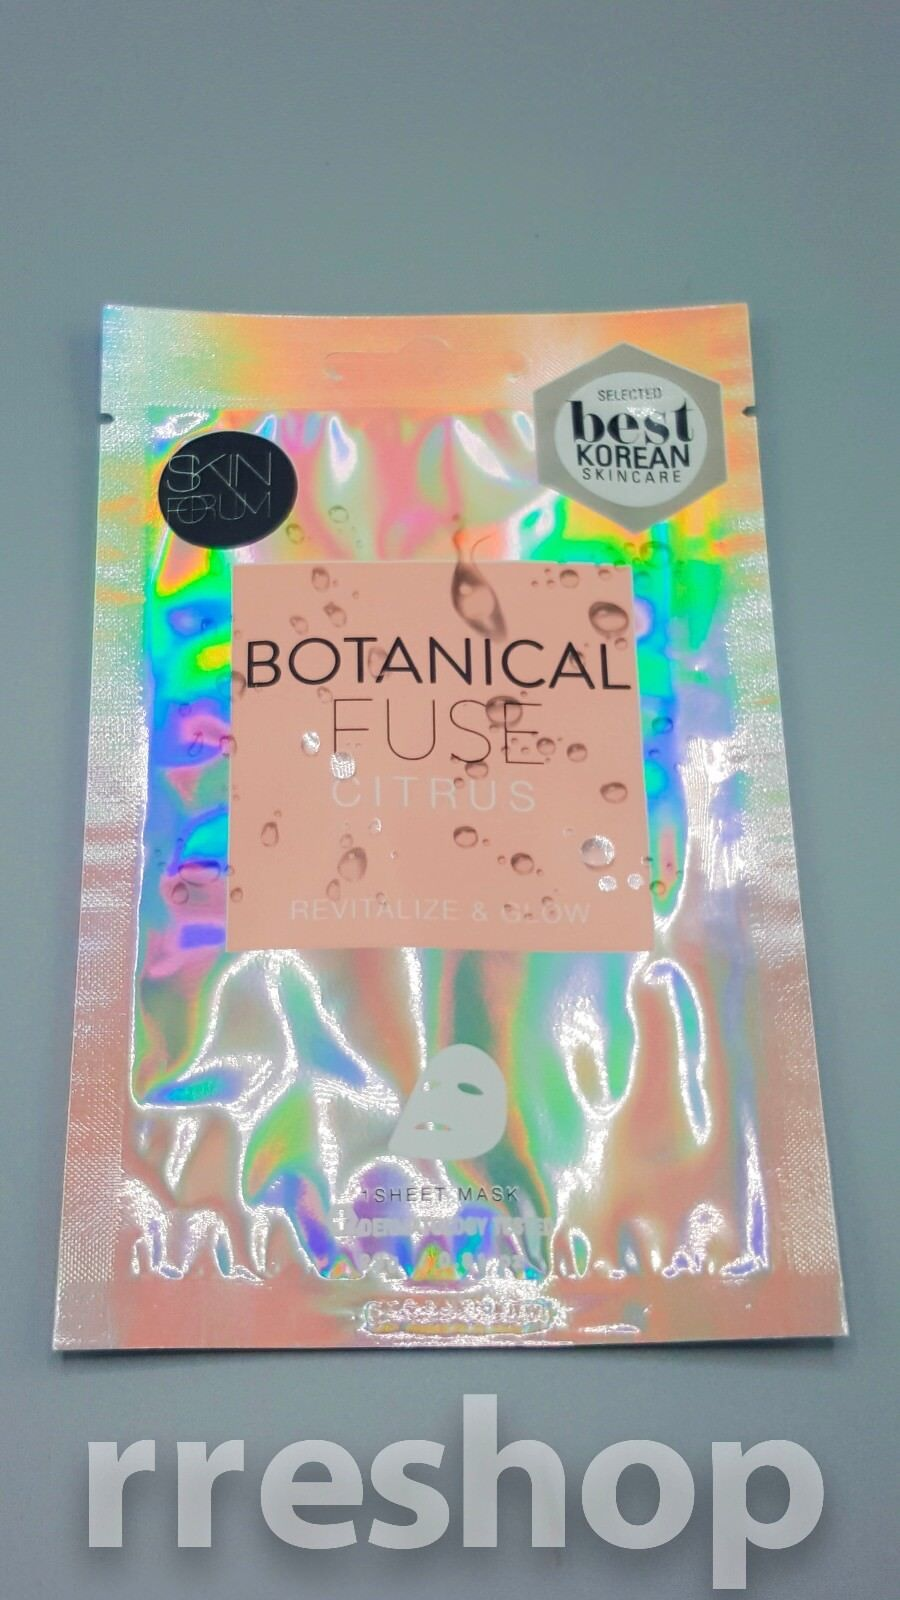 Skin Forum Botanical Fuse Citrus Revitalize & Glow Mask 0 81 oz